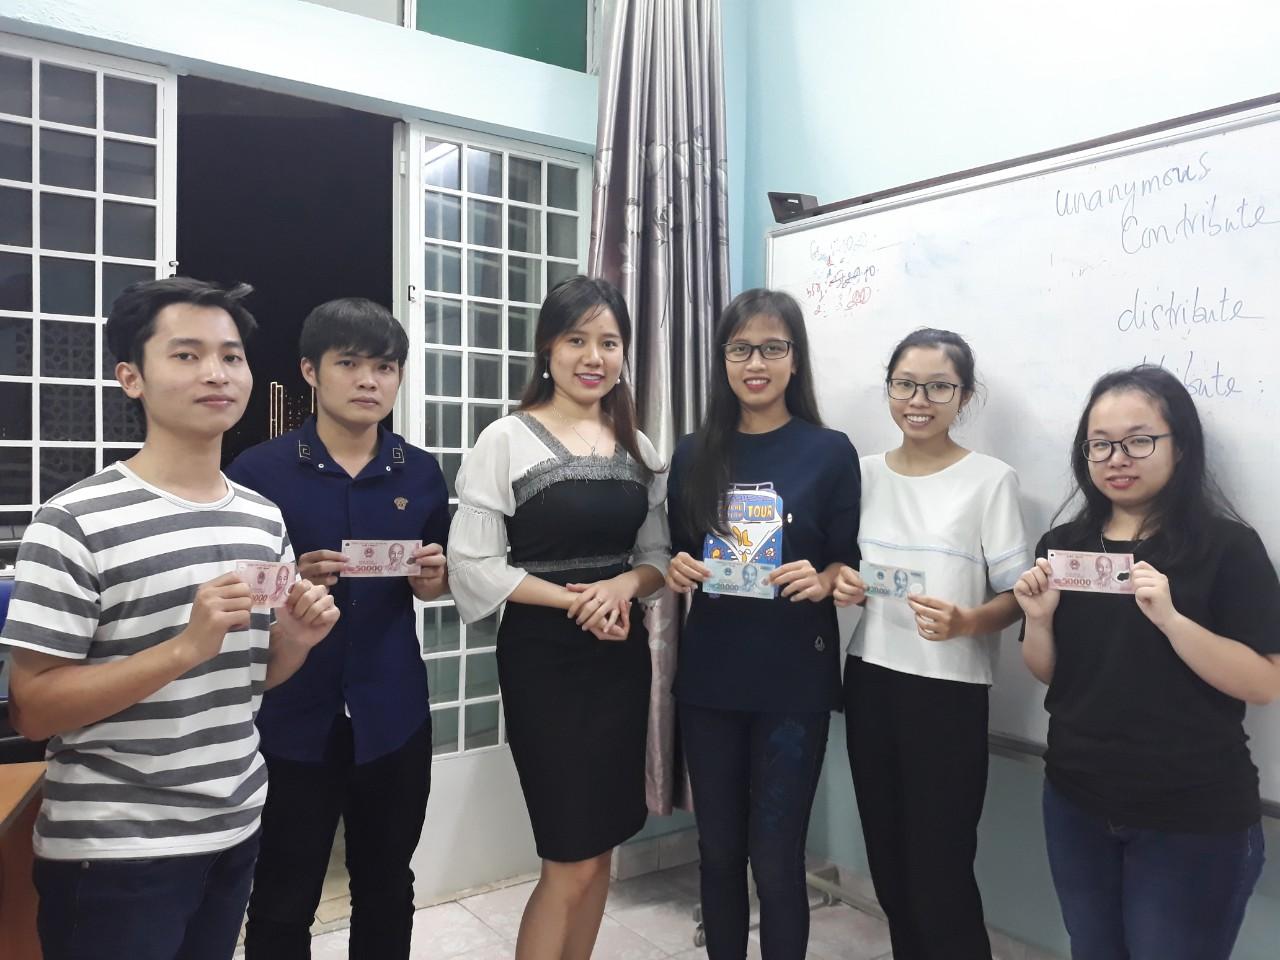 toeic-msngoc-lop-basic-toeic-sang-t7-cn--chuan-phat-am-khai-giang-22092018-84